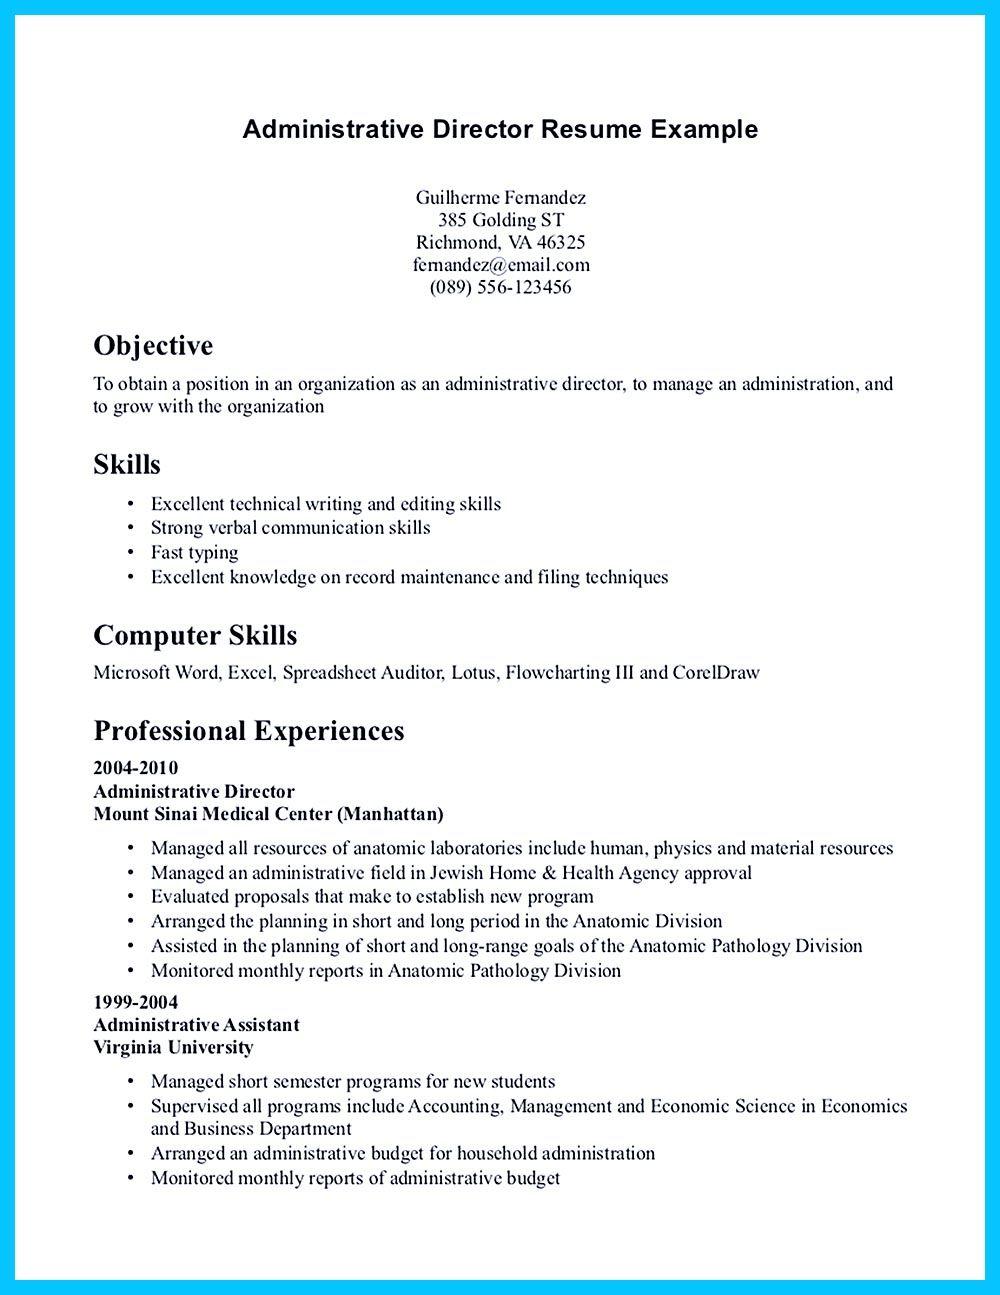 High Quality Entry Level Administrative Assistant Resume Samples Administrative Assistant Resume Languages Resume Education Resume